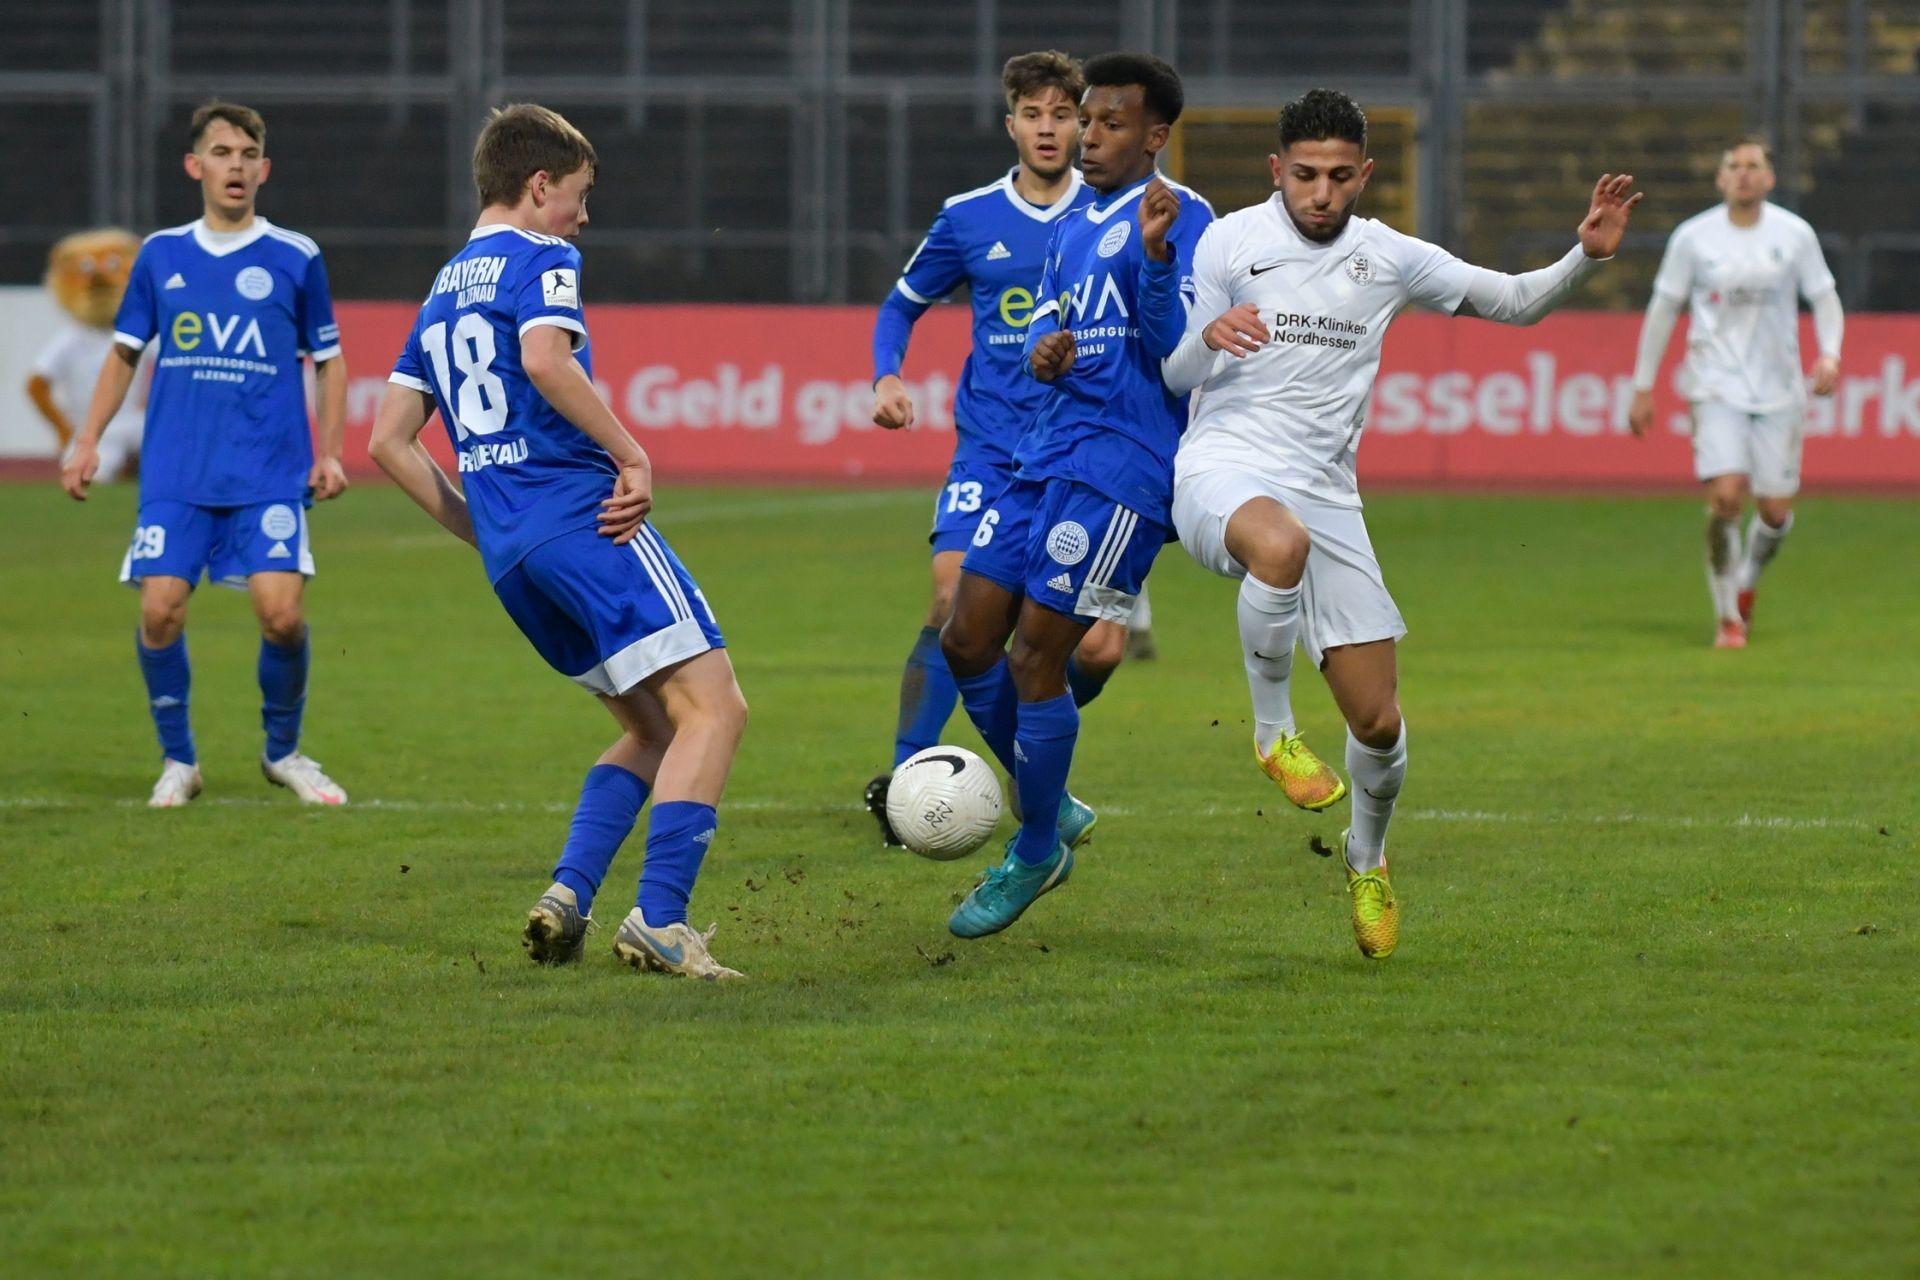 Regionalliga S�dwest 2020/21, KSV Hessen Kassel, FC Bayern Alzenau, Endstand 3:0